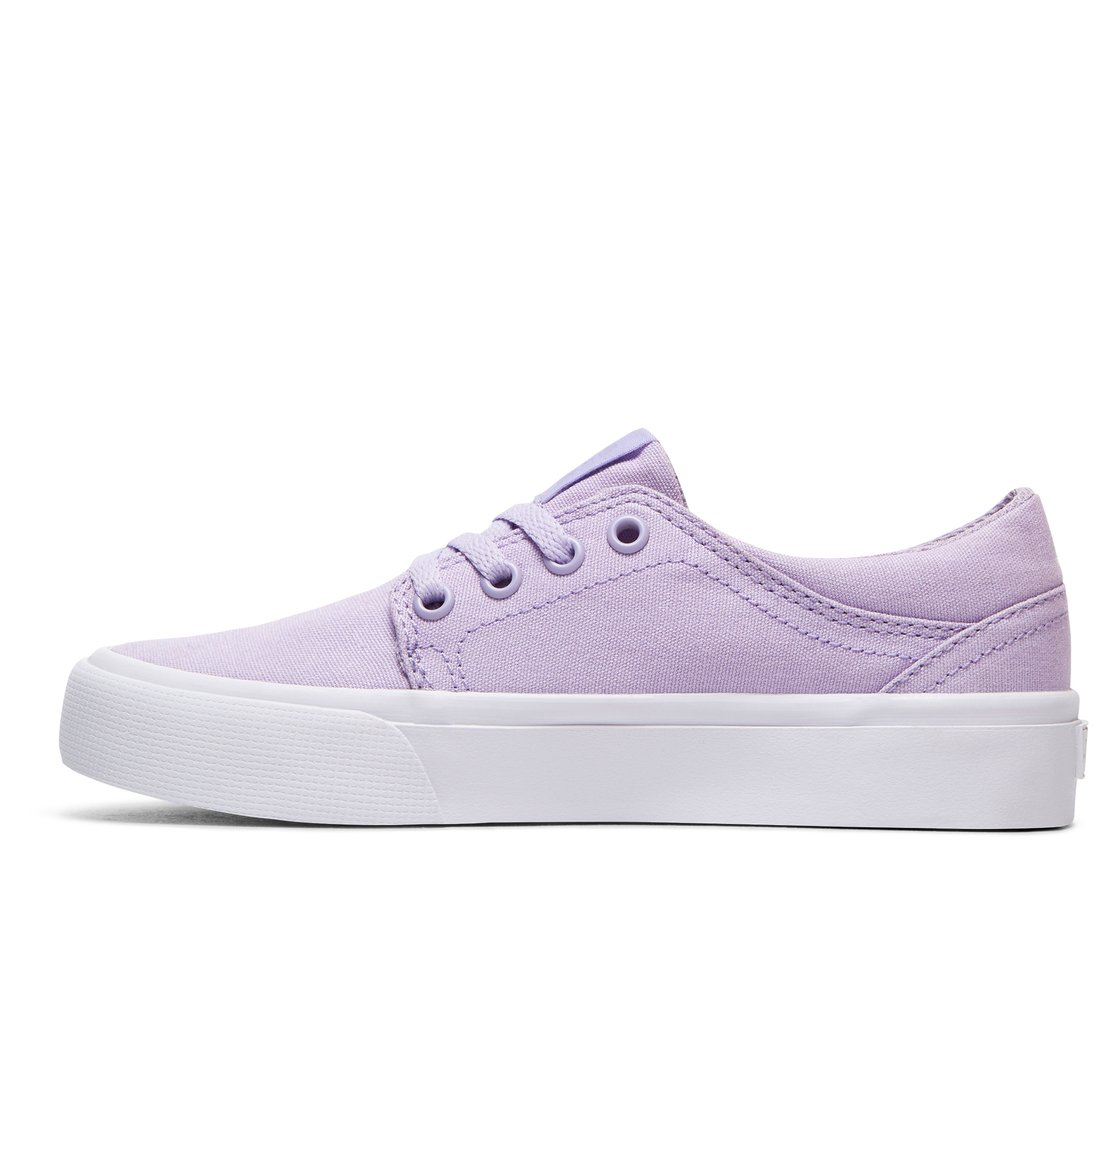 DC Shoes Schuhe »Trase TX«, lila, Lilac